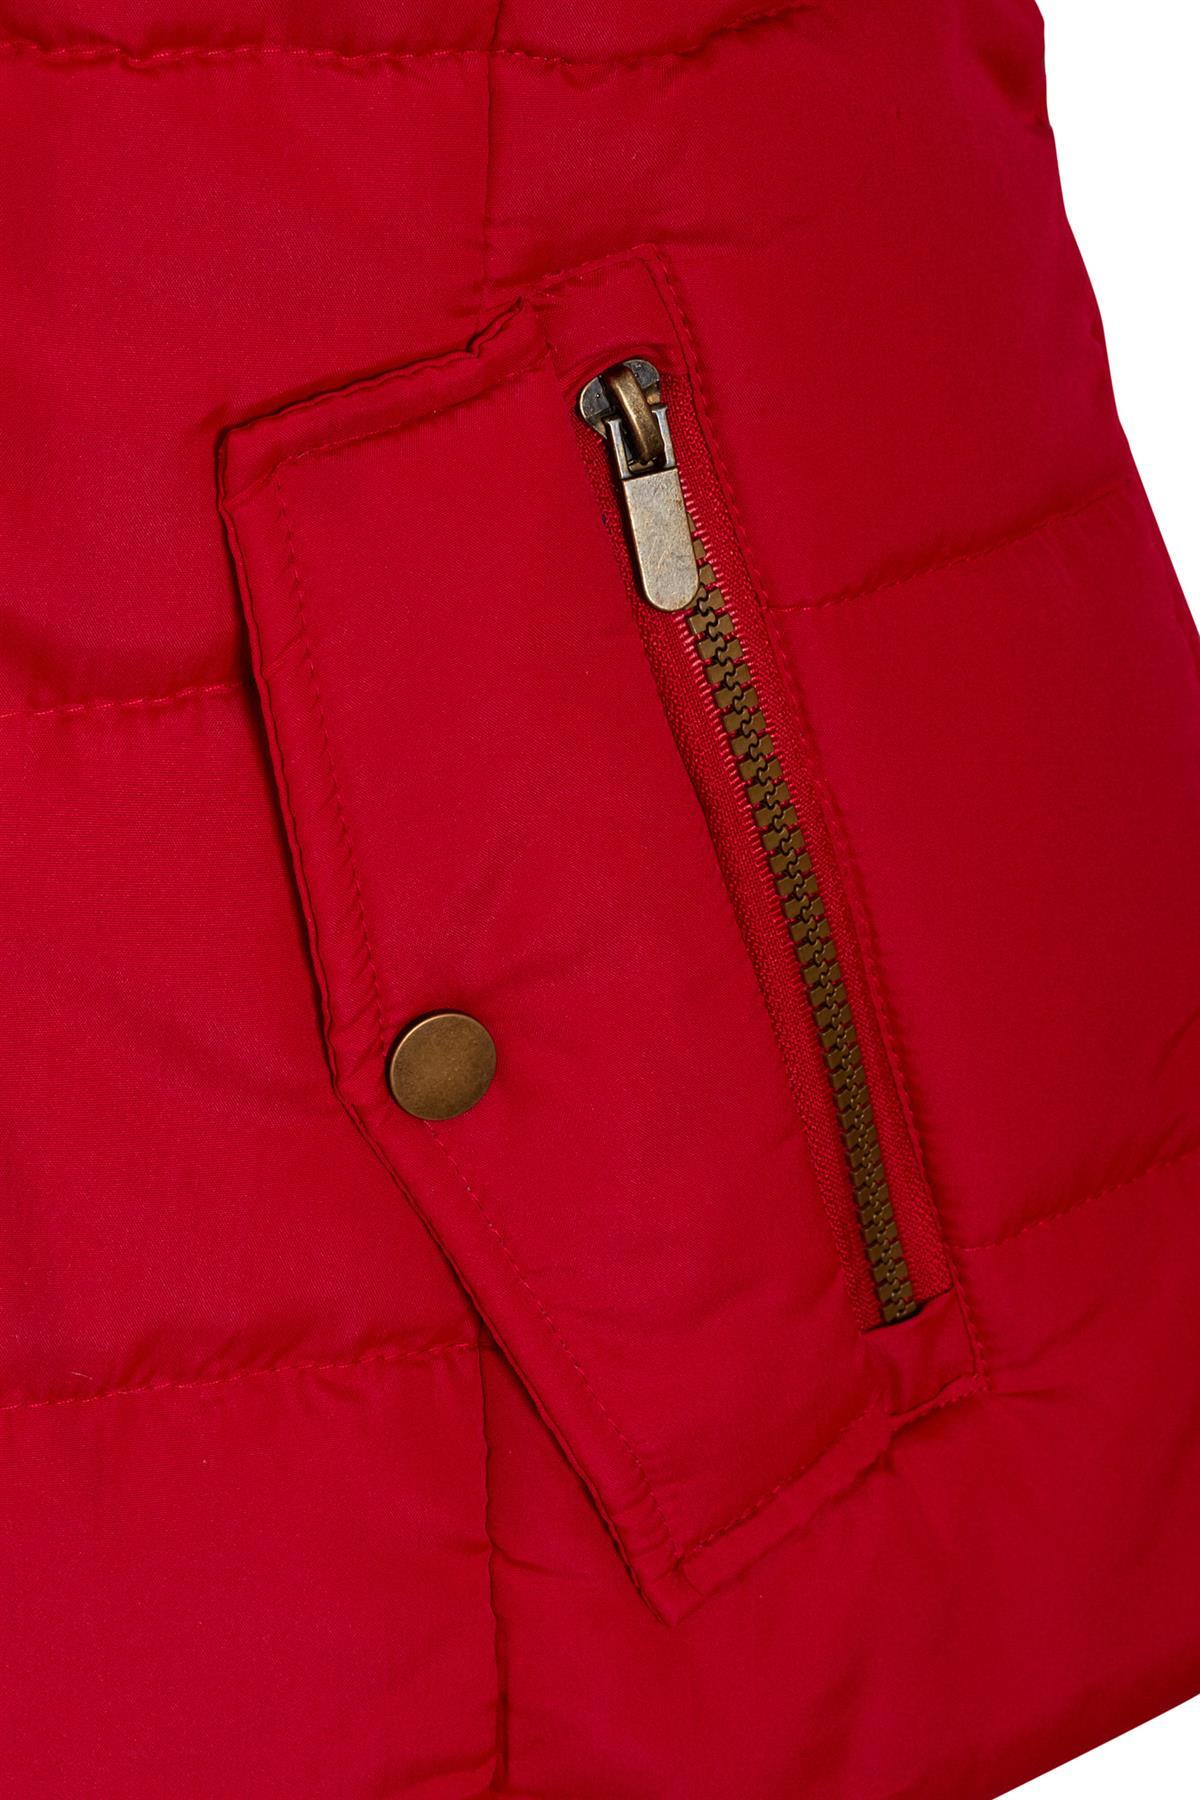 Shelikes-Ladies-Padded-Faux-Fur-Trim-Hood-Hooded-Jacket-Winter-Coat-Size-6-to-16 miniatuur 12